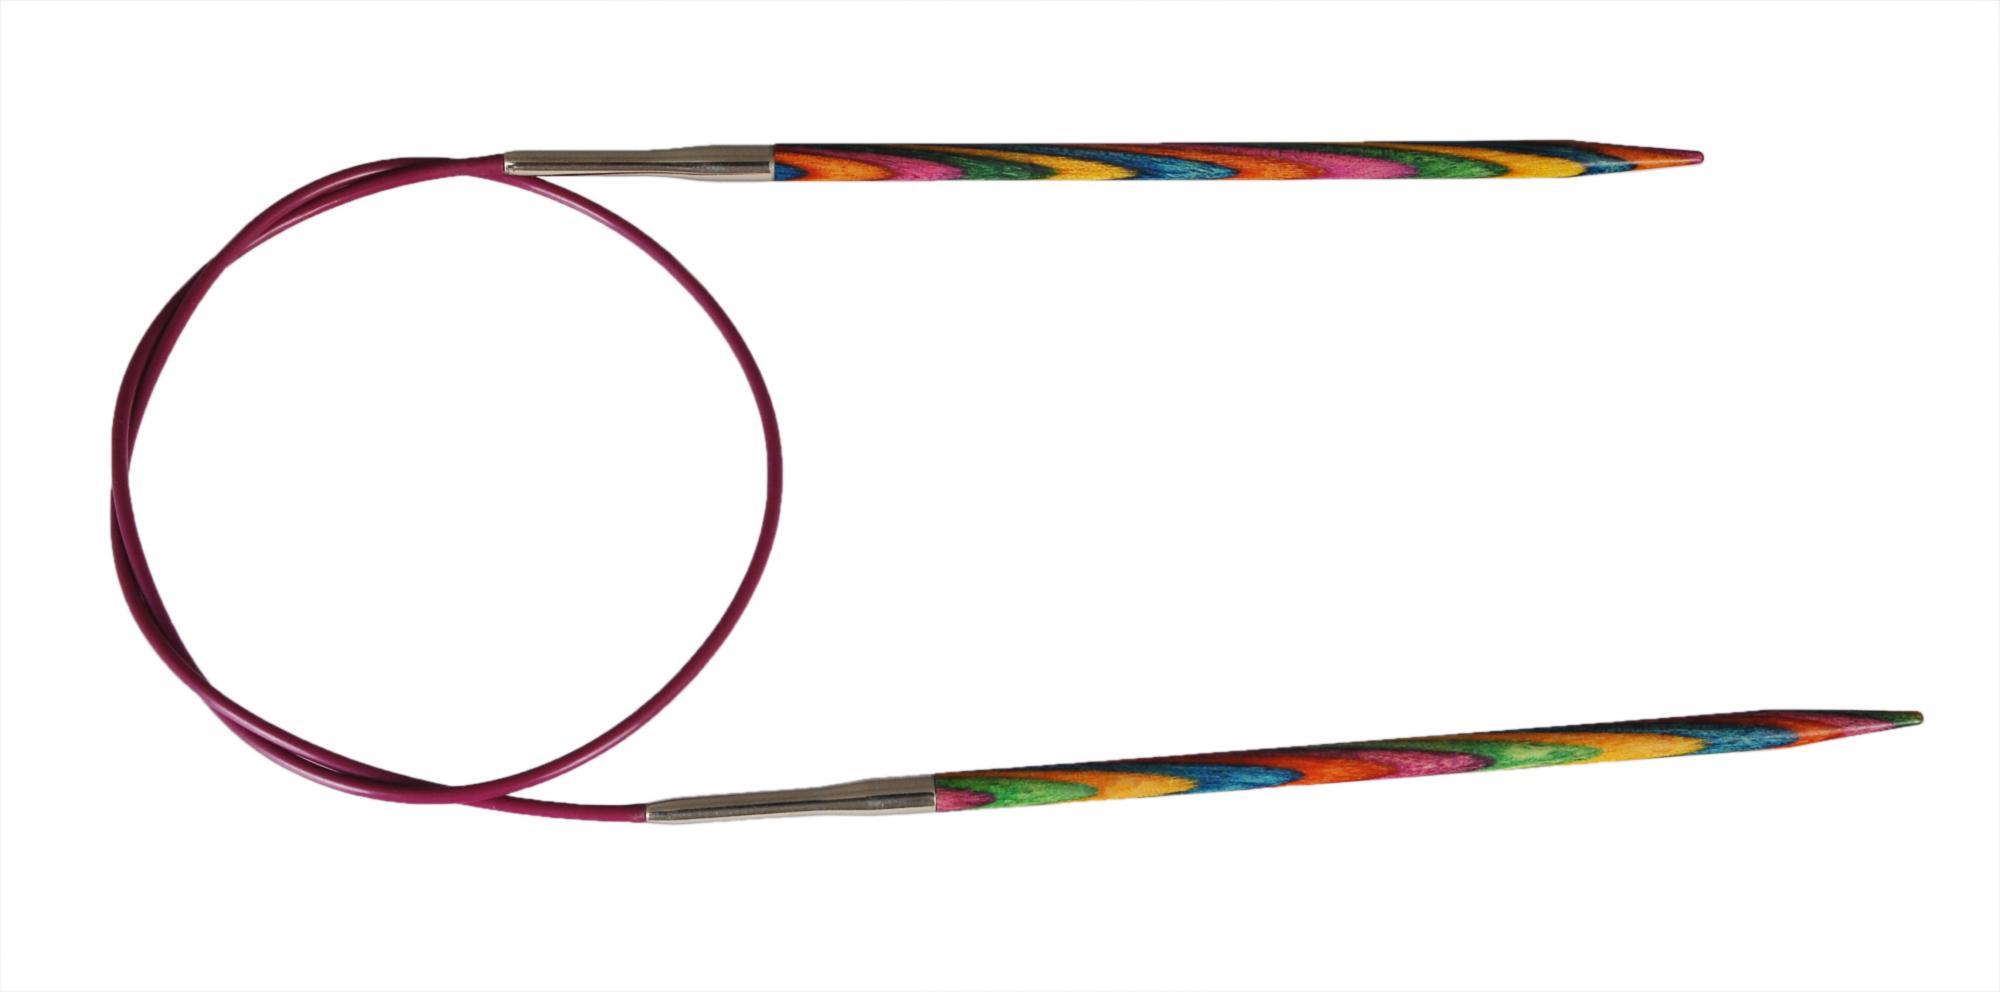 Спицы круговые 100 см Symfonie Wood KnitPro, 20362, 2.25 мм